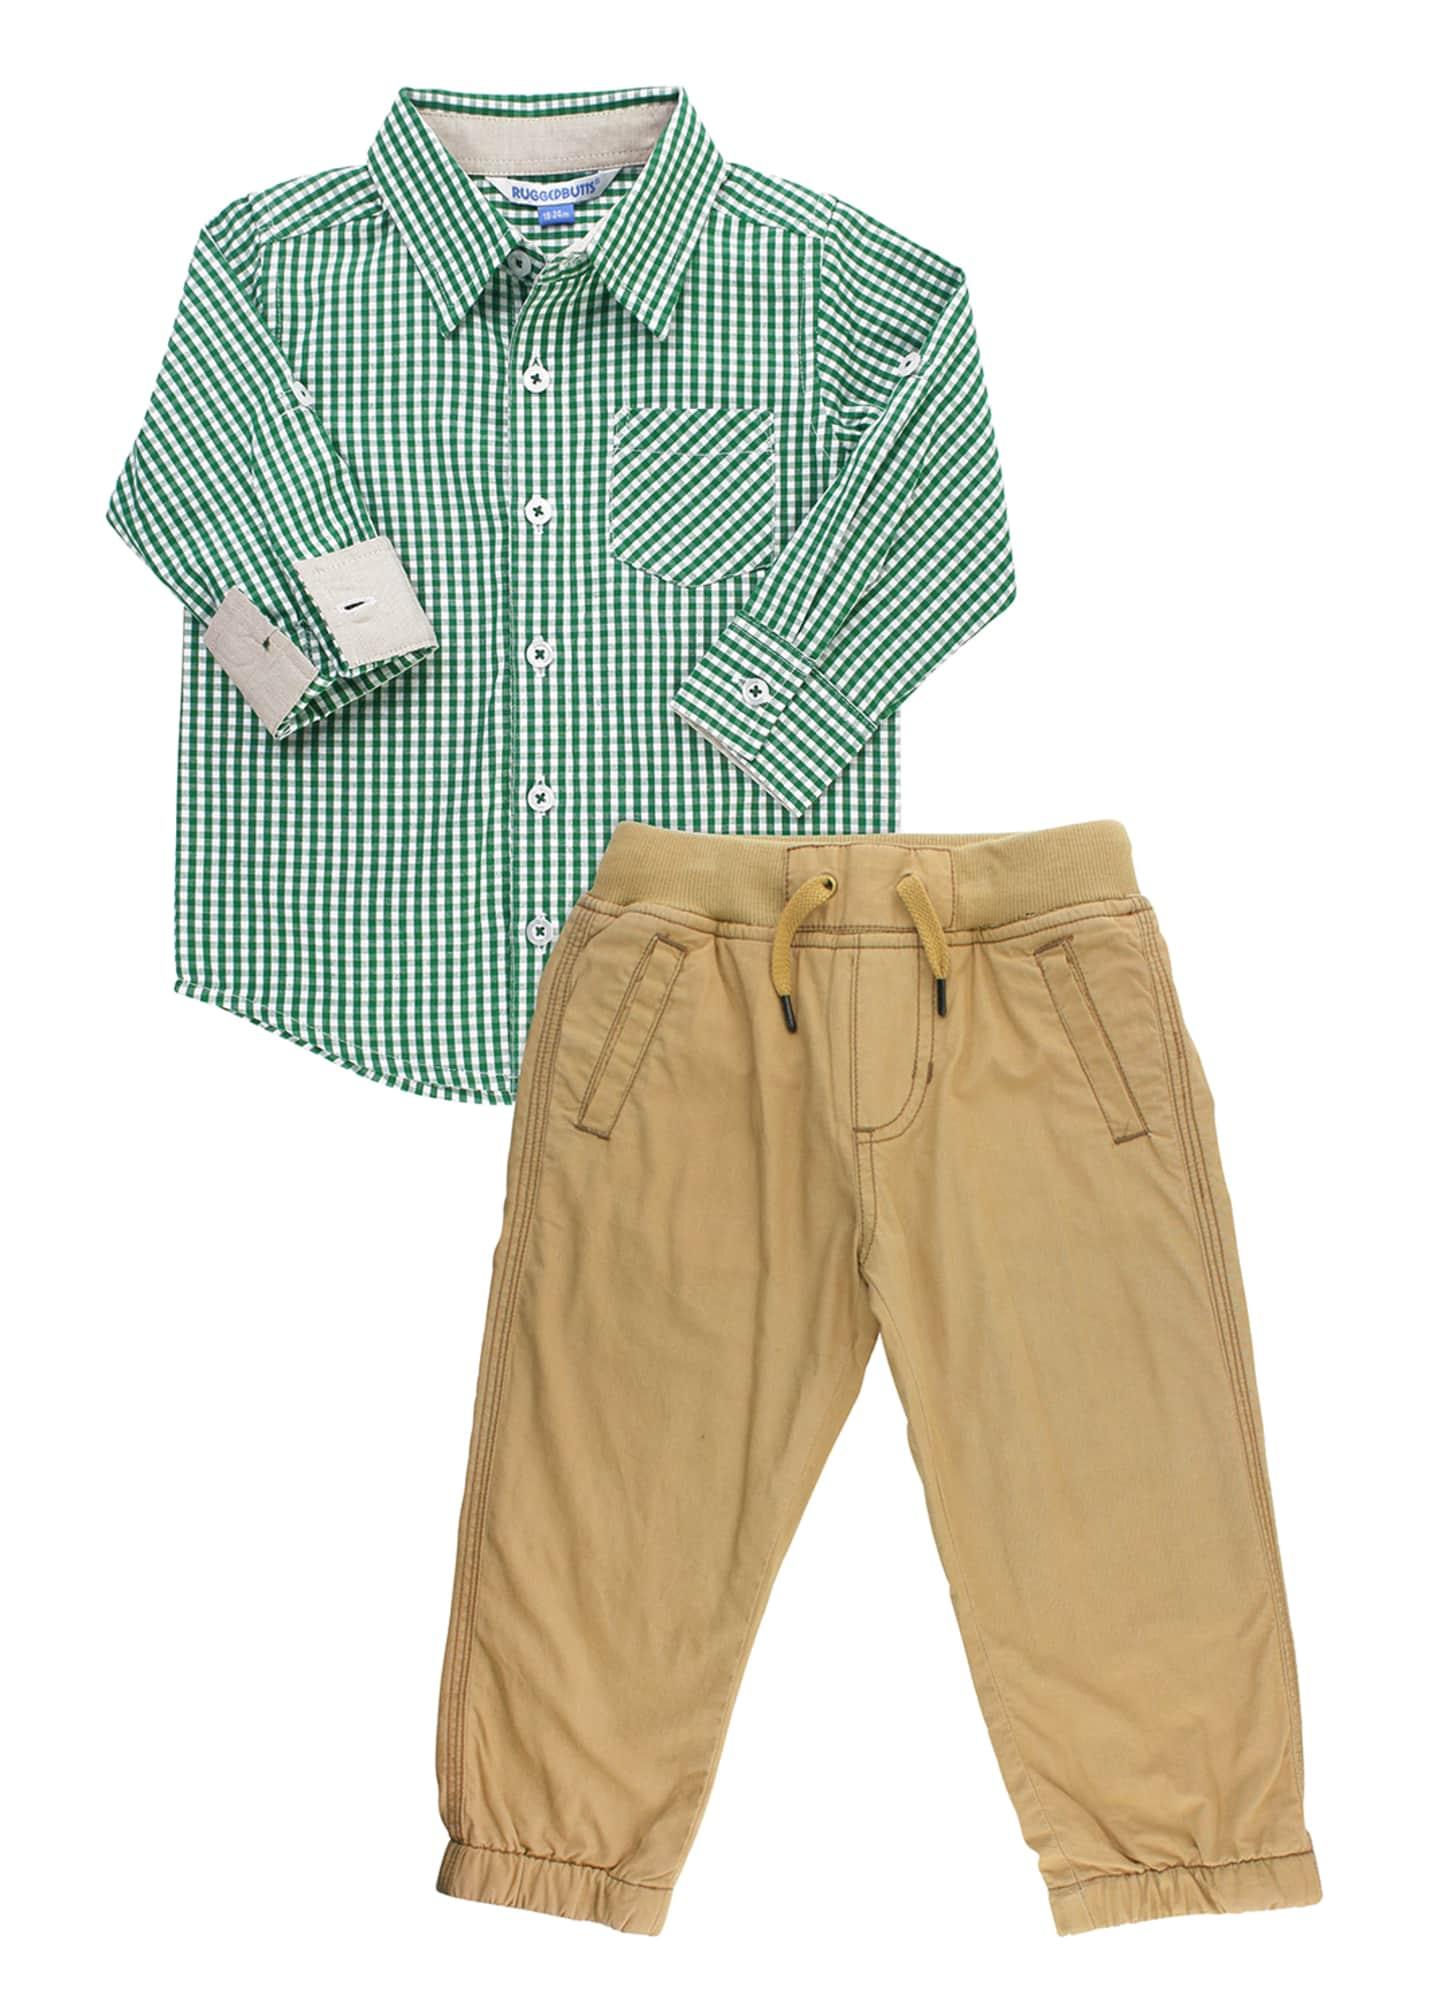 RuffleButts Boy's Gingham Shirt w/ Khaki Chino Pants,